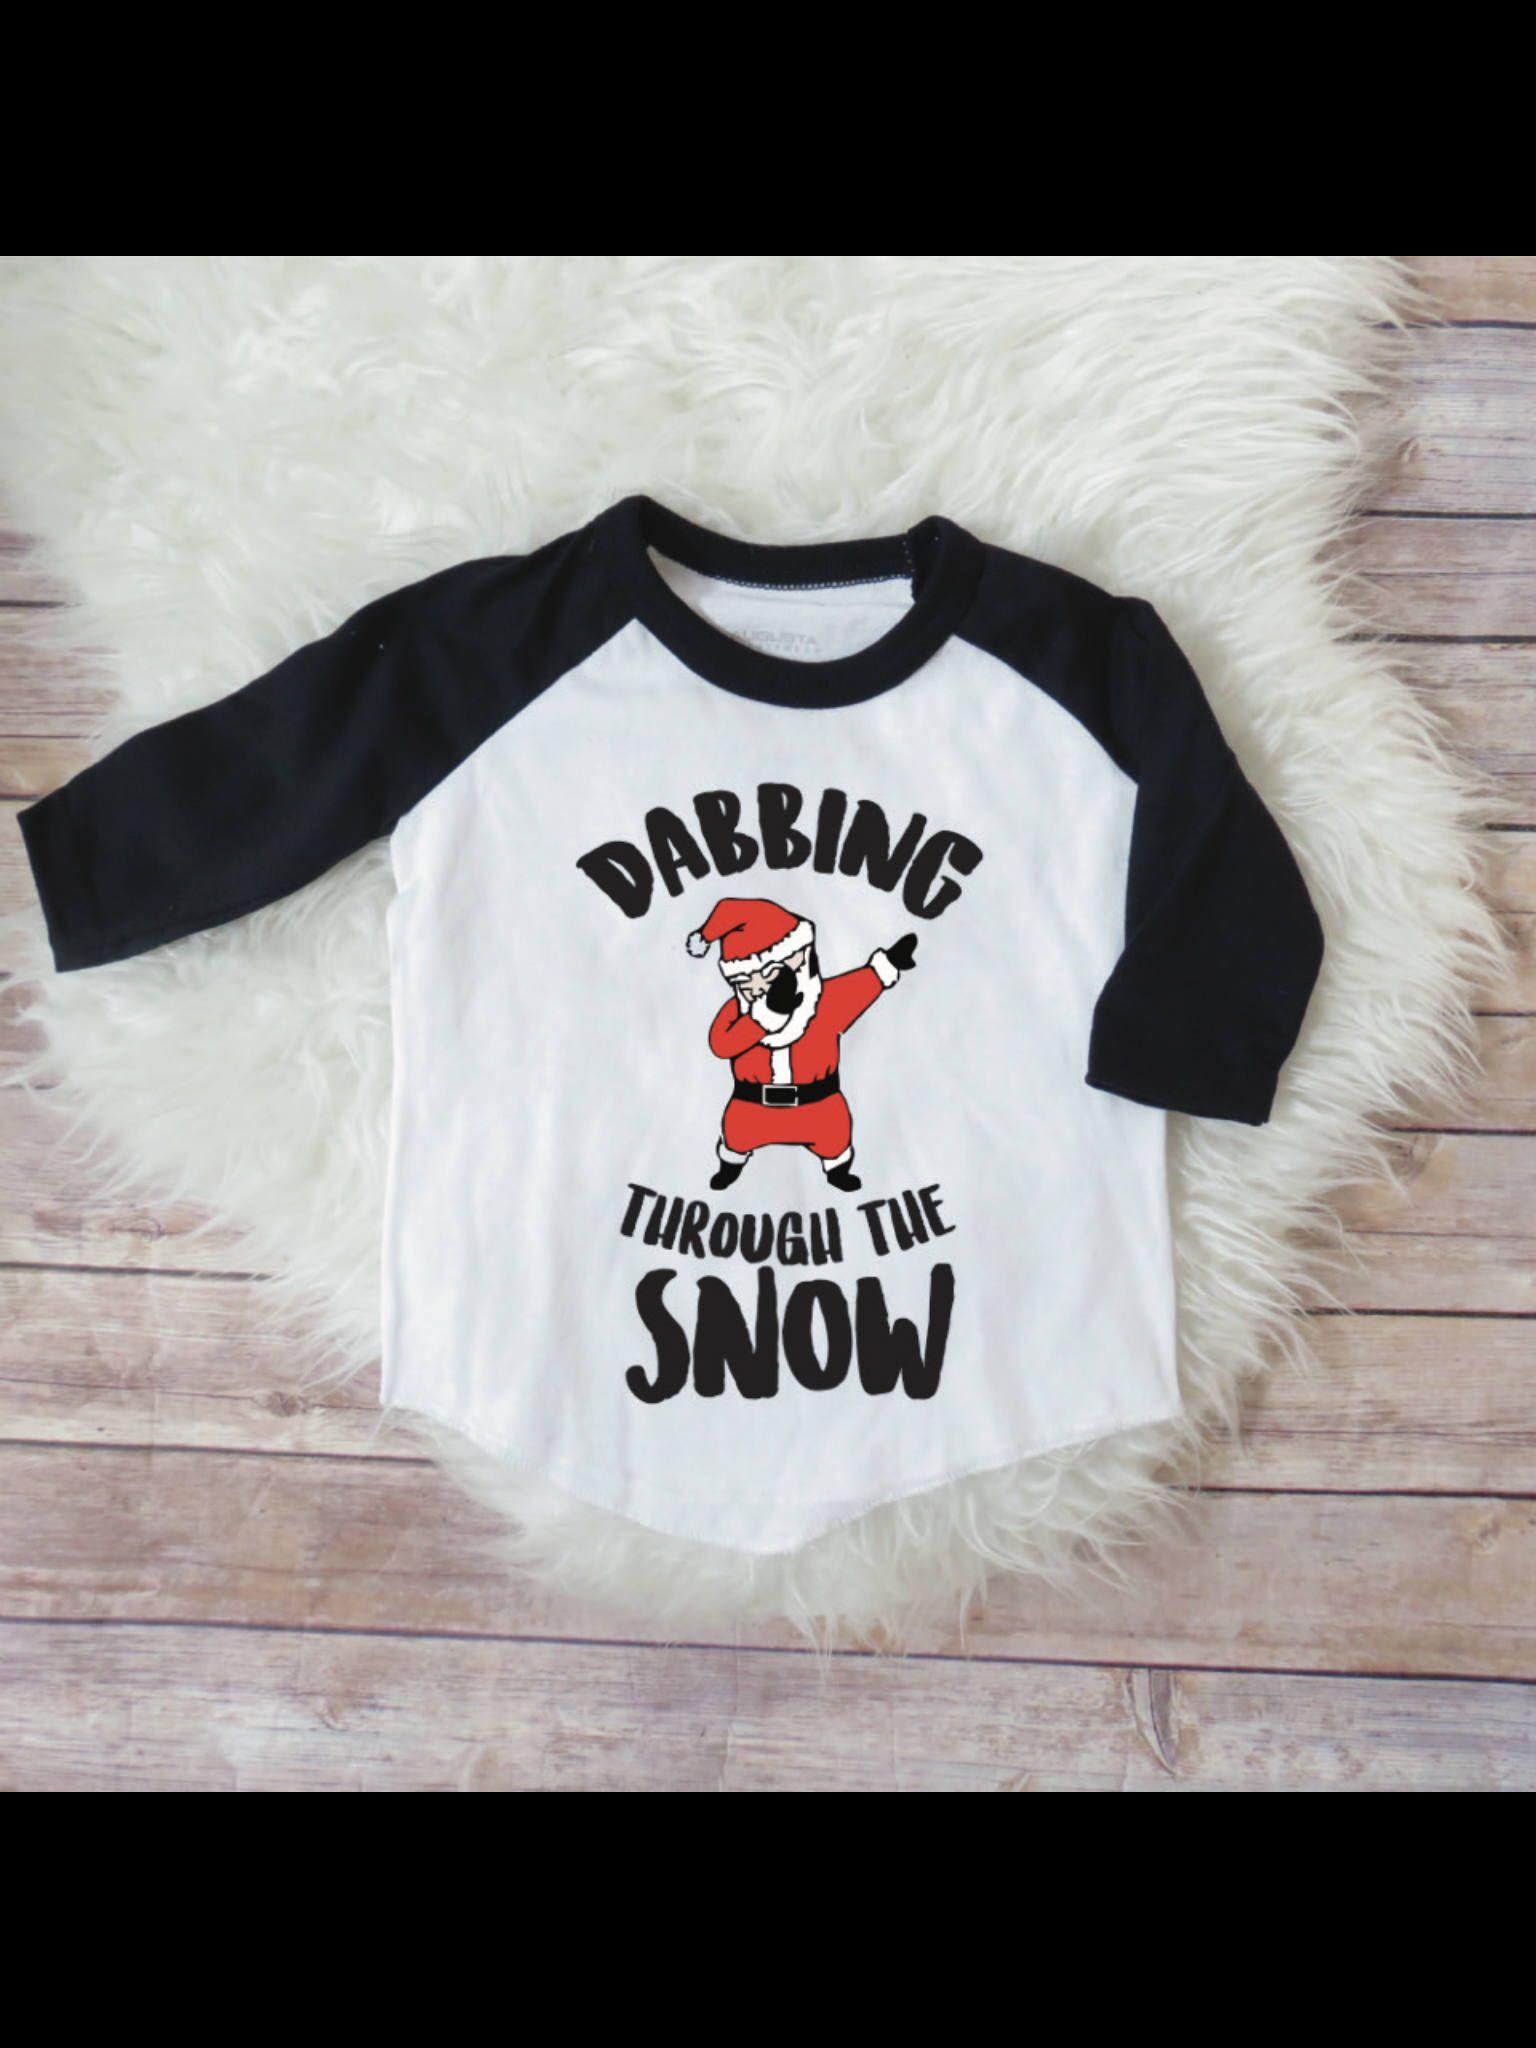 Dabbing through the snow, funny kids shirt, funny santa shirt, funny ...